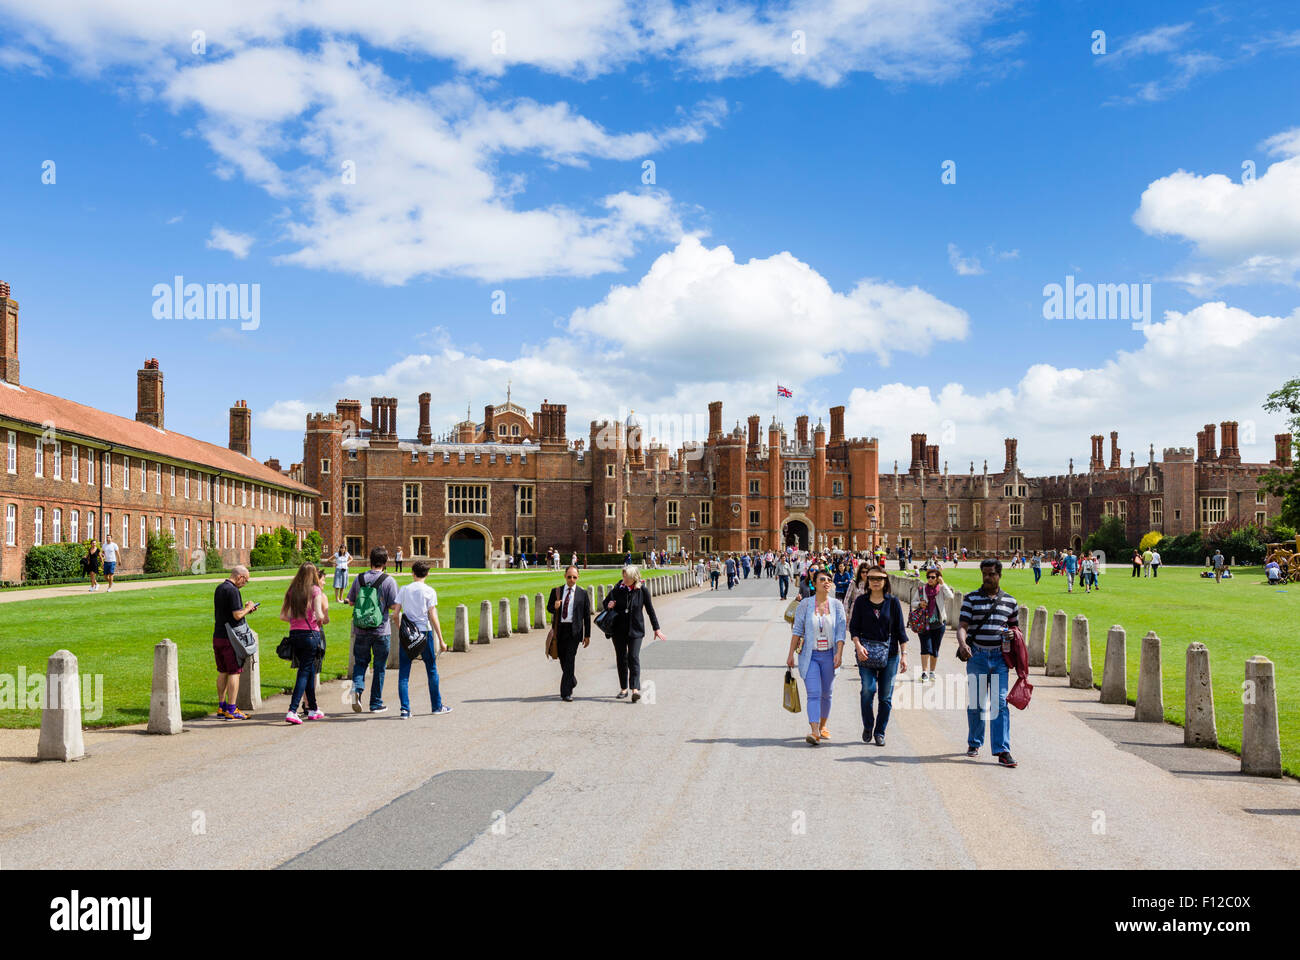 Visitors at the entrance to Hampton Court Palace, Richmond upon Thames, London, England, UK - Stock Image